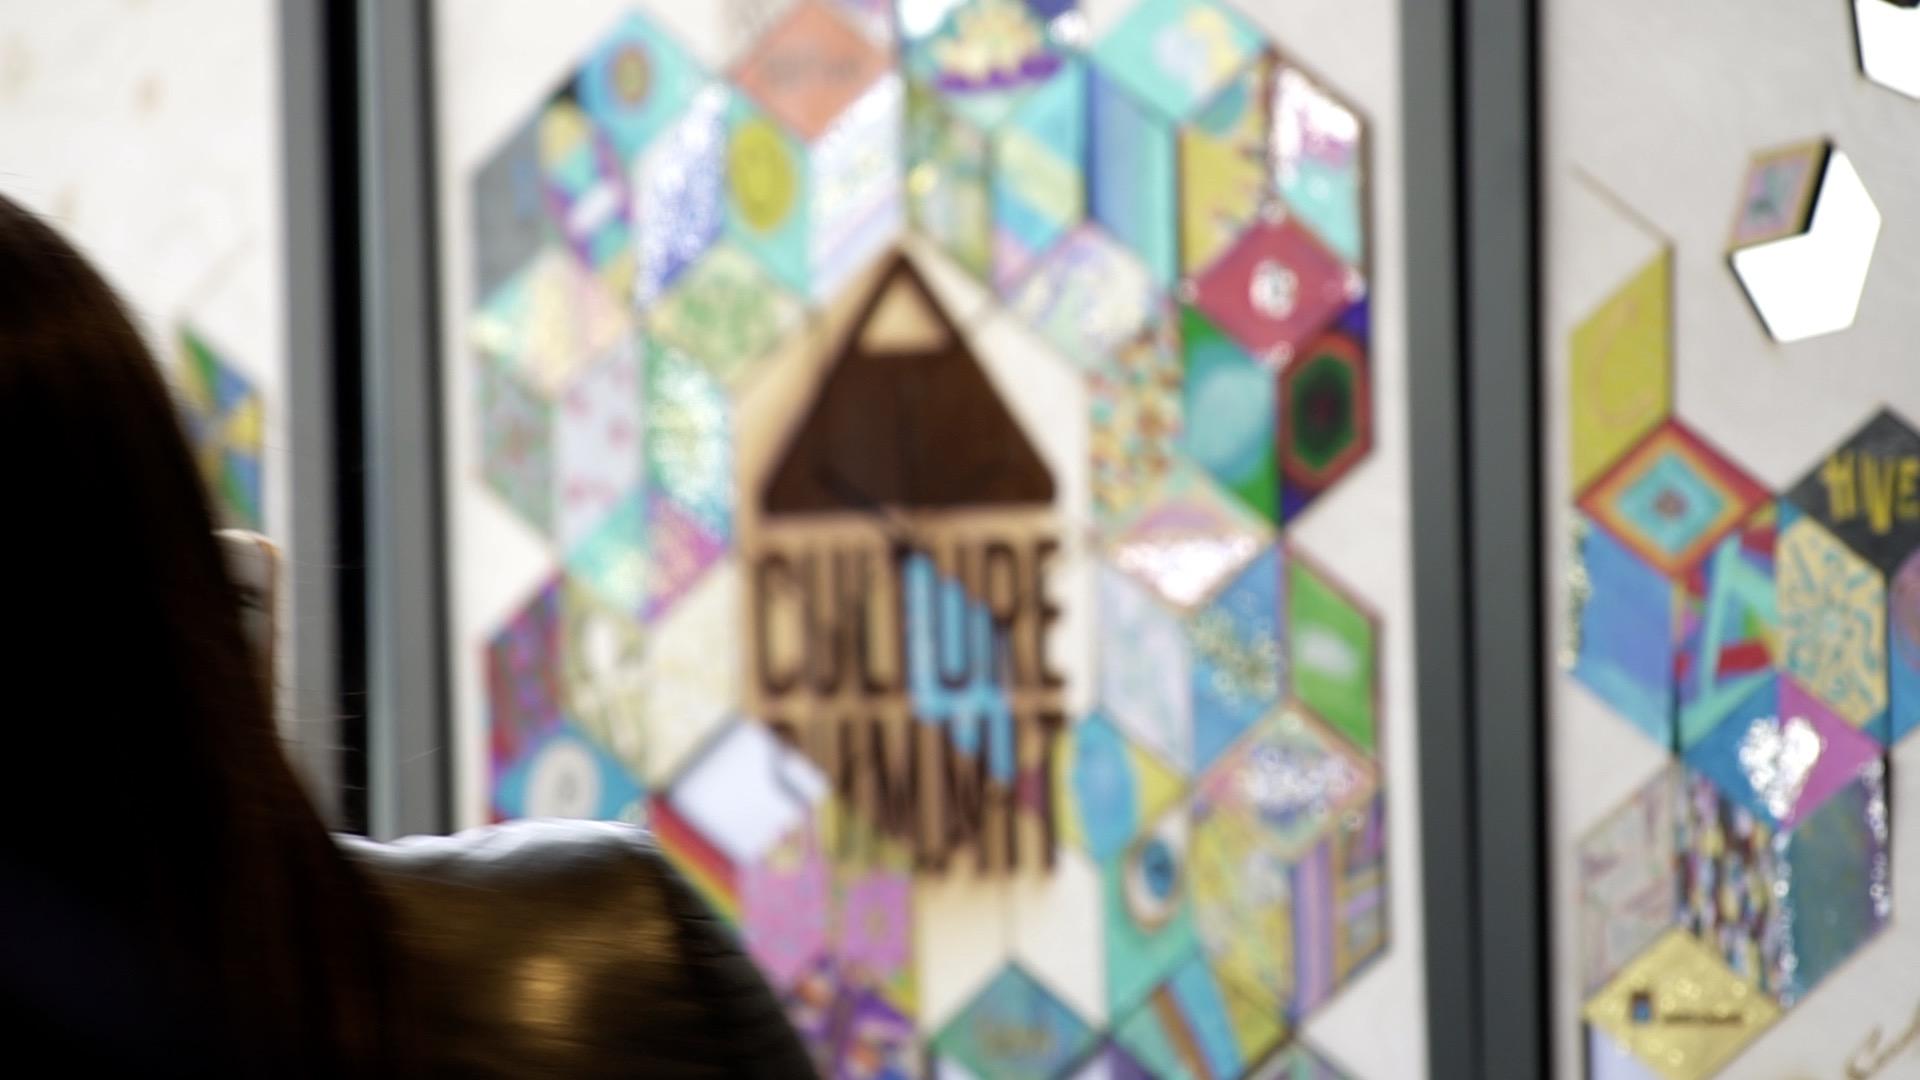 Taking photo Culture Summit Mosaic